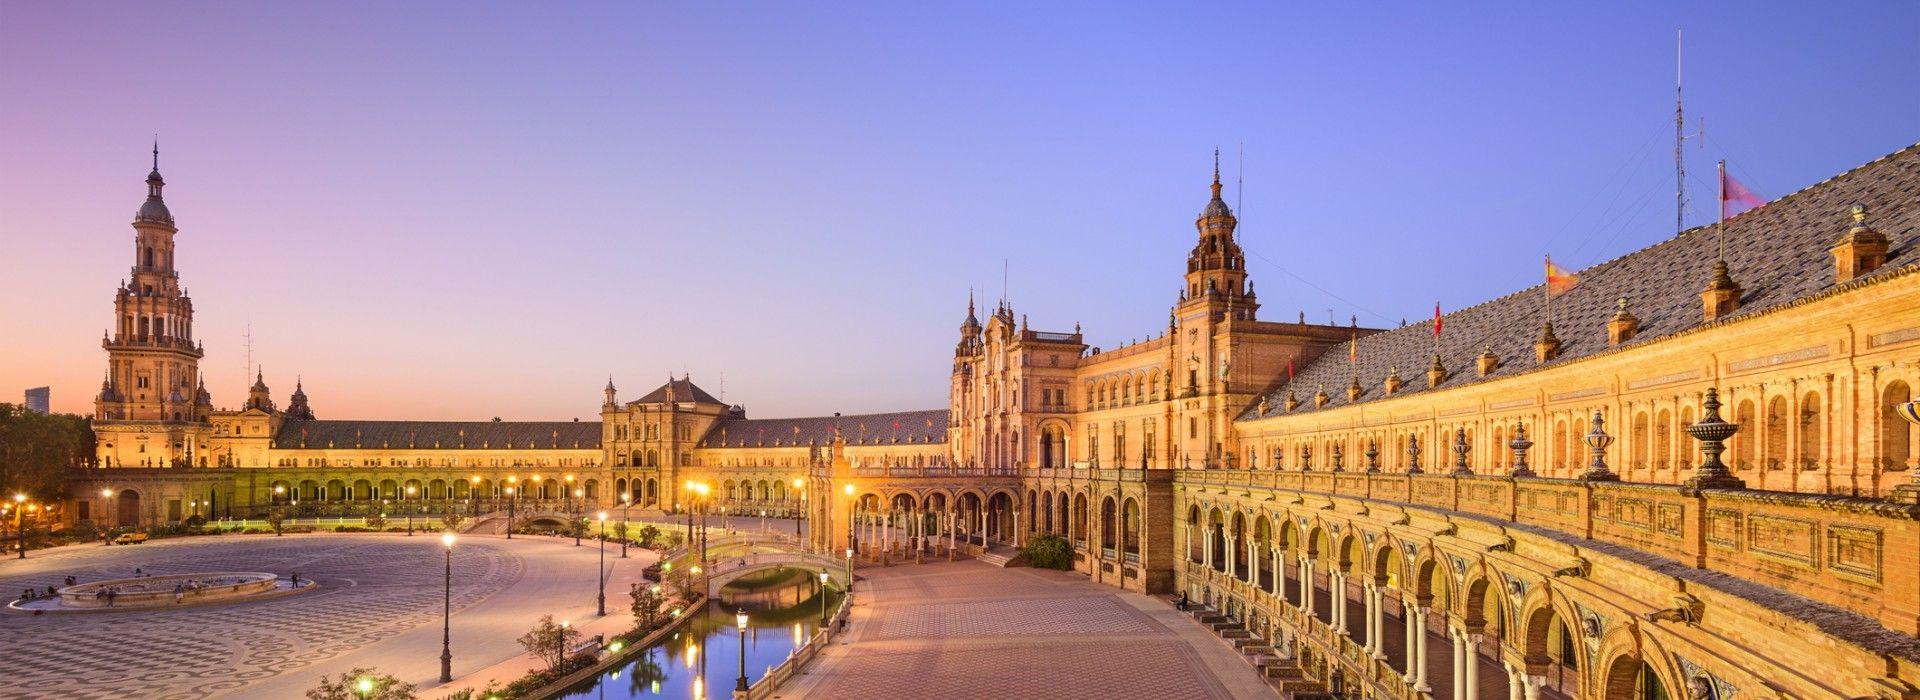 Natural landmarks sightseeing Tours in Spain